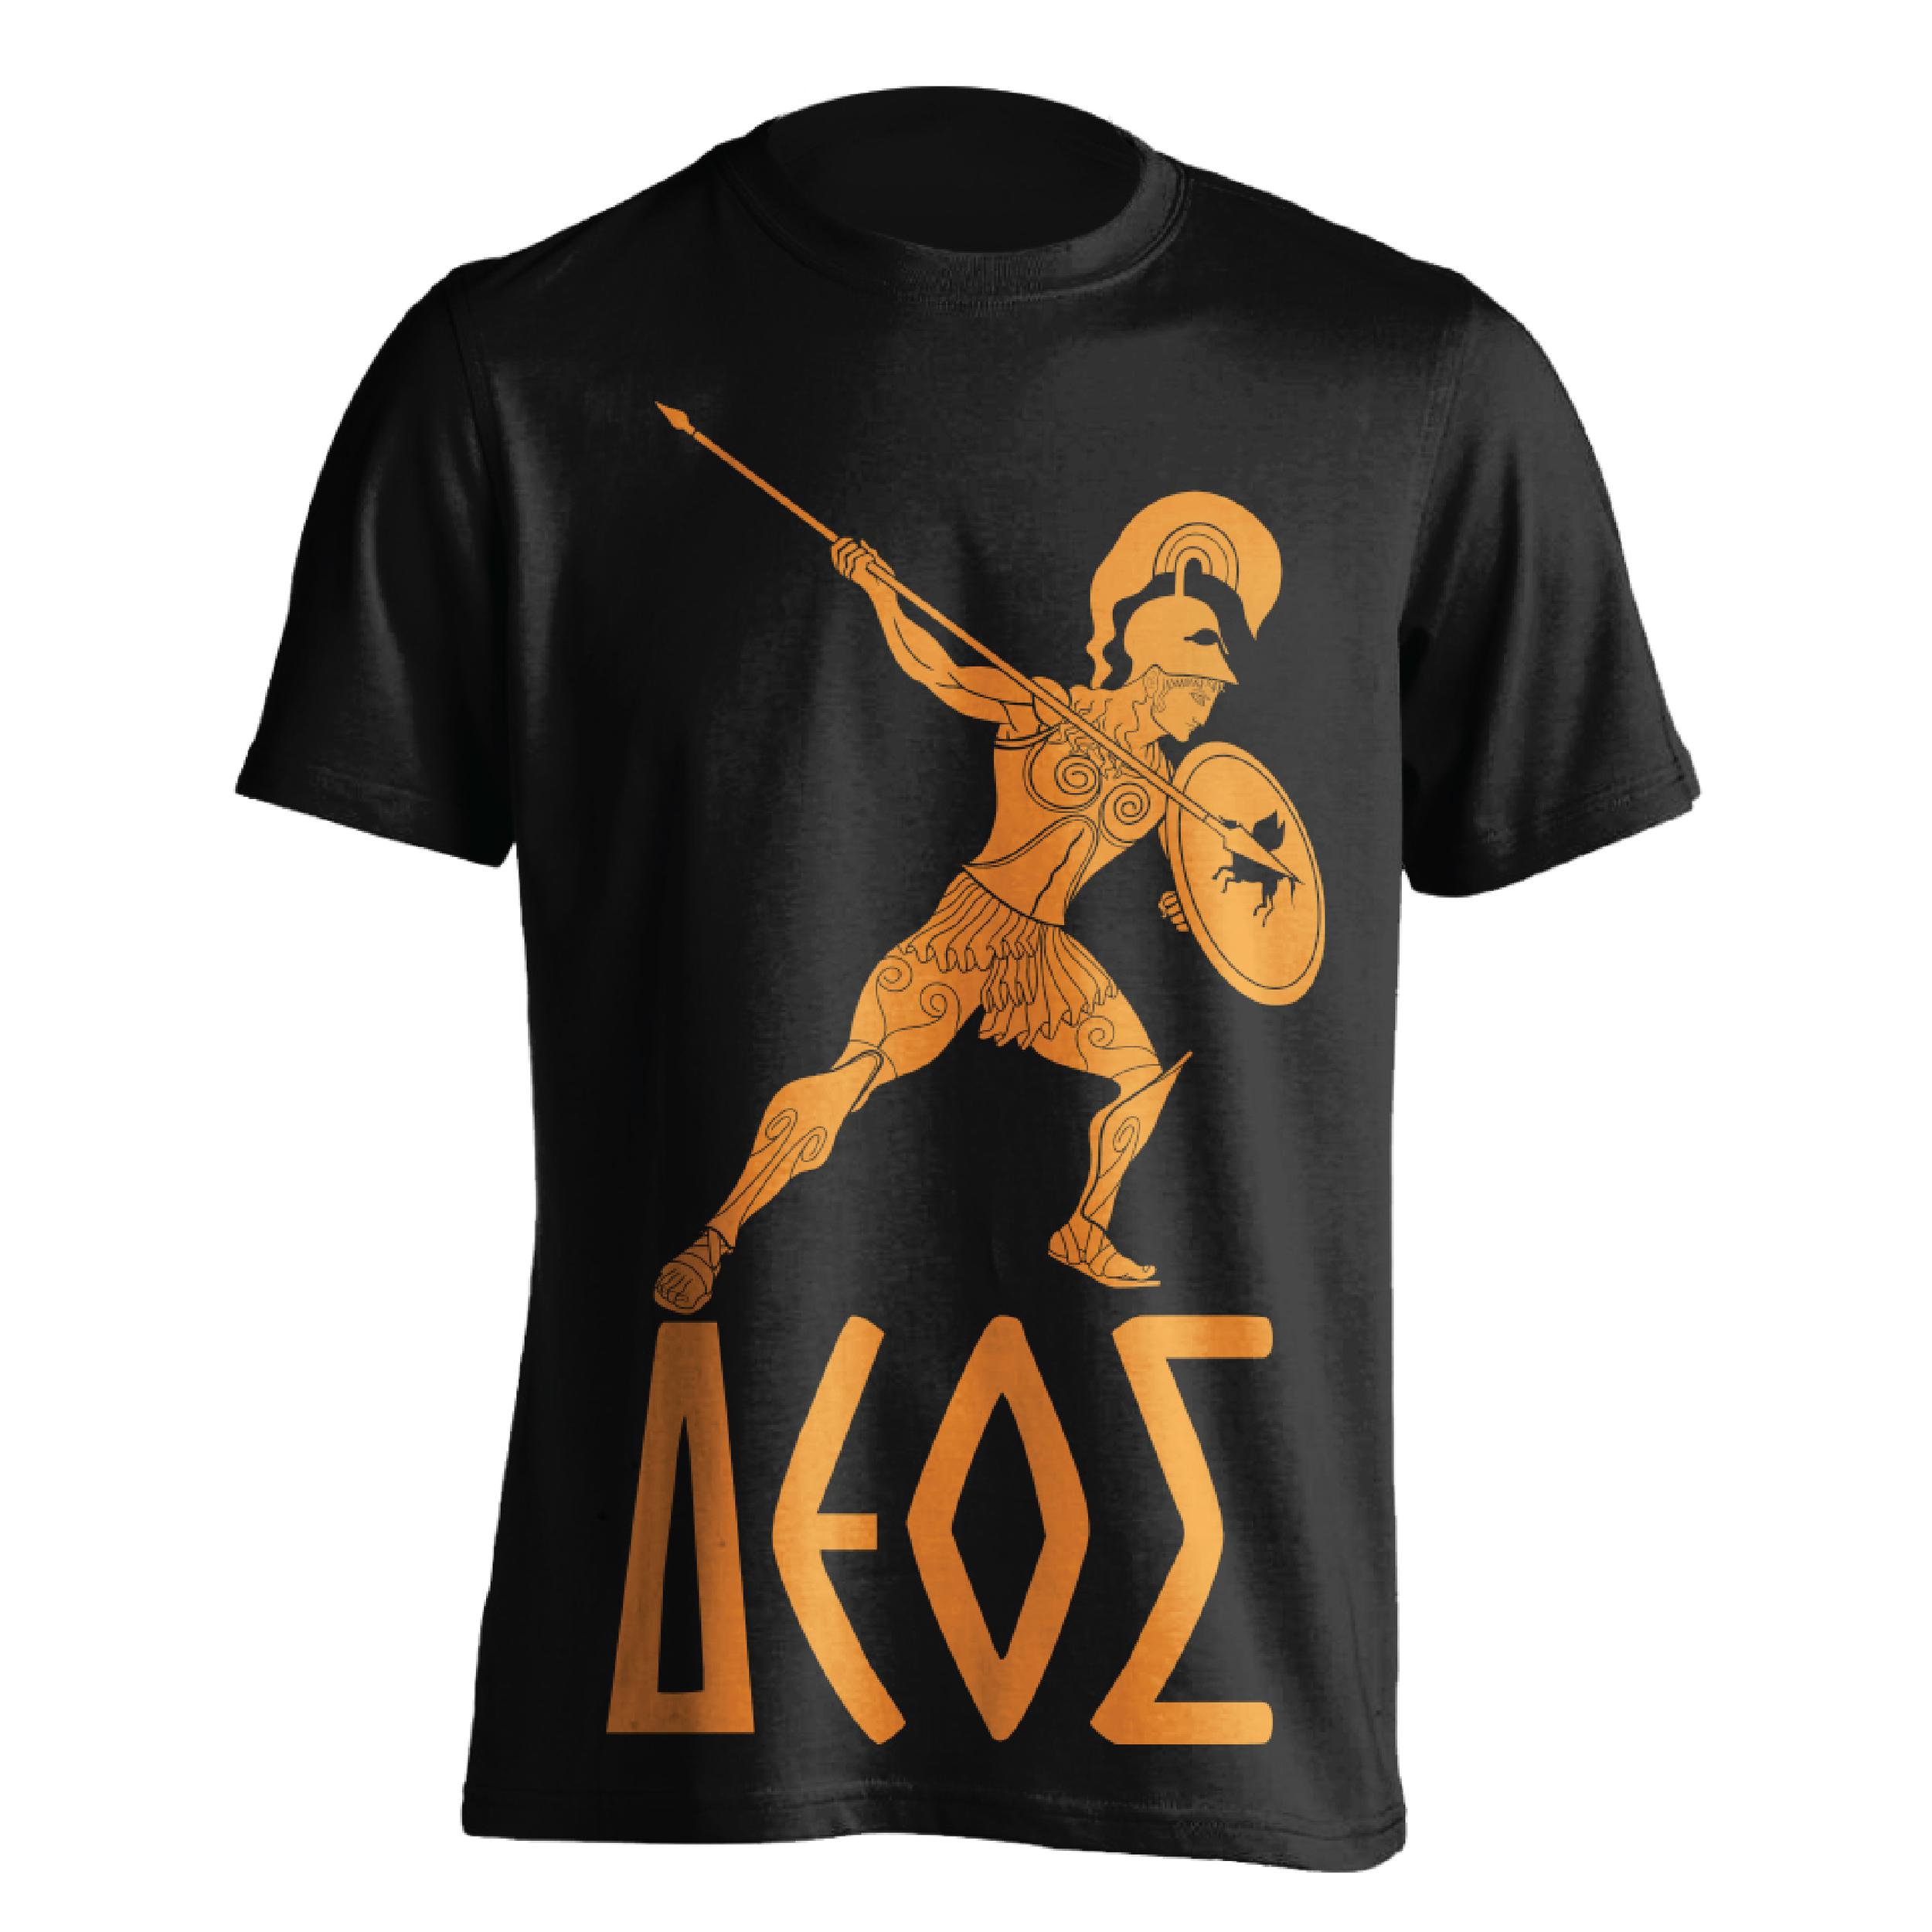 achilles-greek-raskol-apparel-orozco-design-studio-robertoorozco-artist-orange-black-shirt-homer-spear-shield-theos-mythology-mythos-warrior-war-spartan-greece-athens-illustration-illustrator-adobe-vector-vector-art-digital-graphic-design-blackmetal.jpg